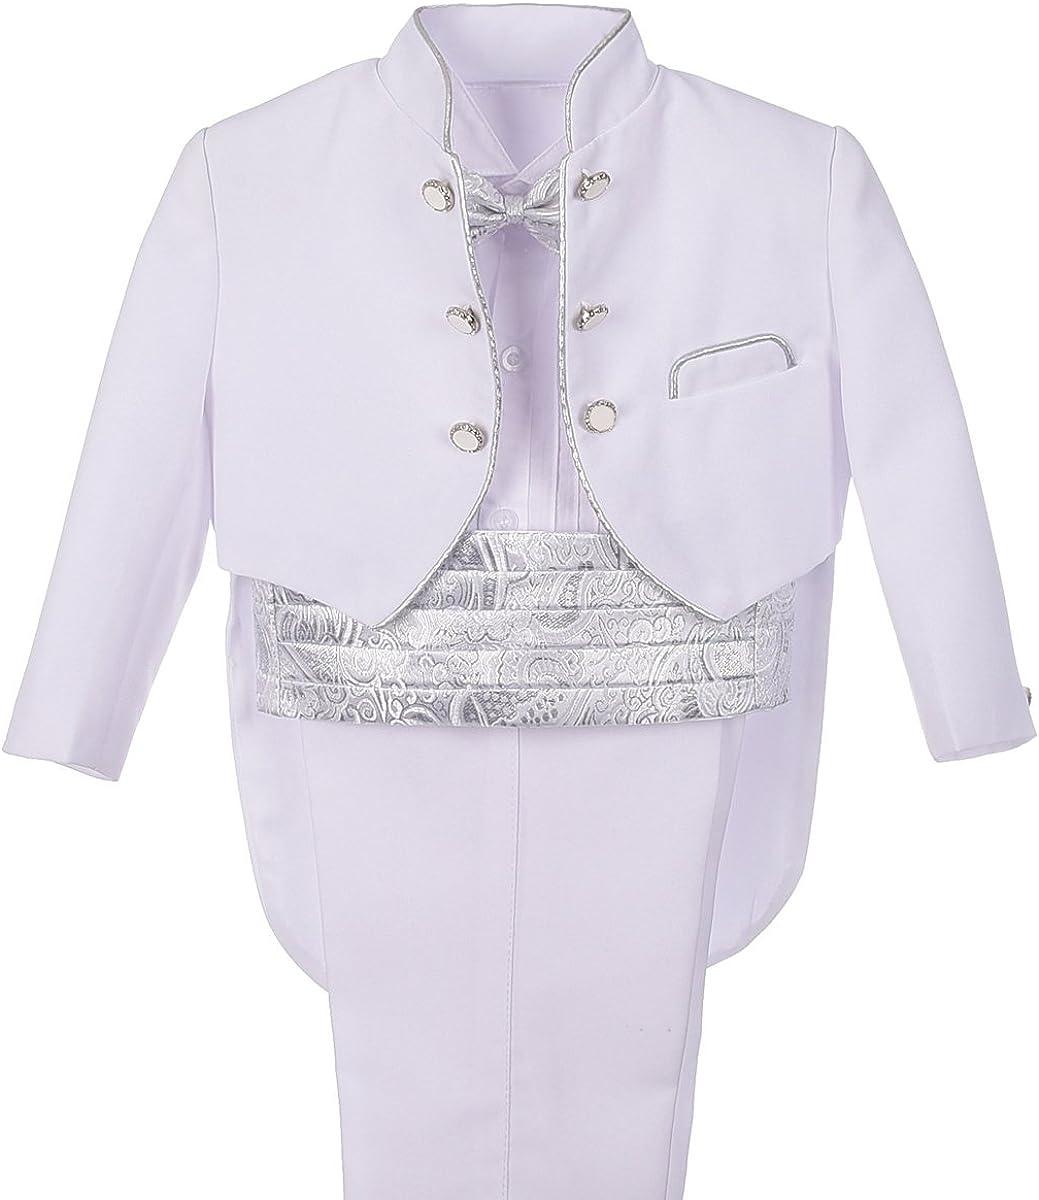 Dressy Daisy Baby Boys' Tuxedo Classic Fit Formal Suits 5 Pcs Set Jacquard Cummerbund